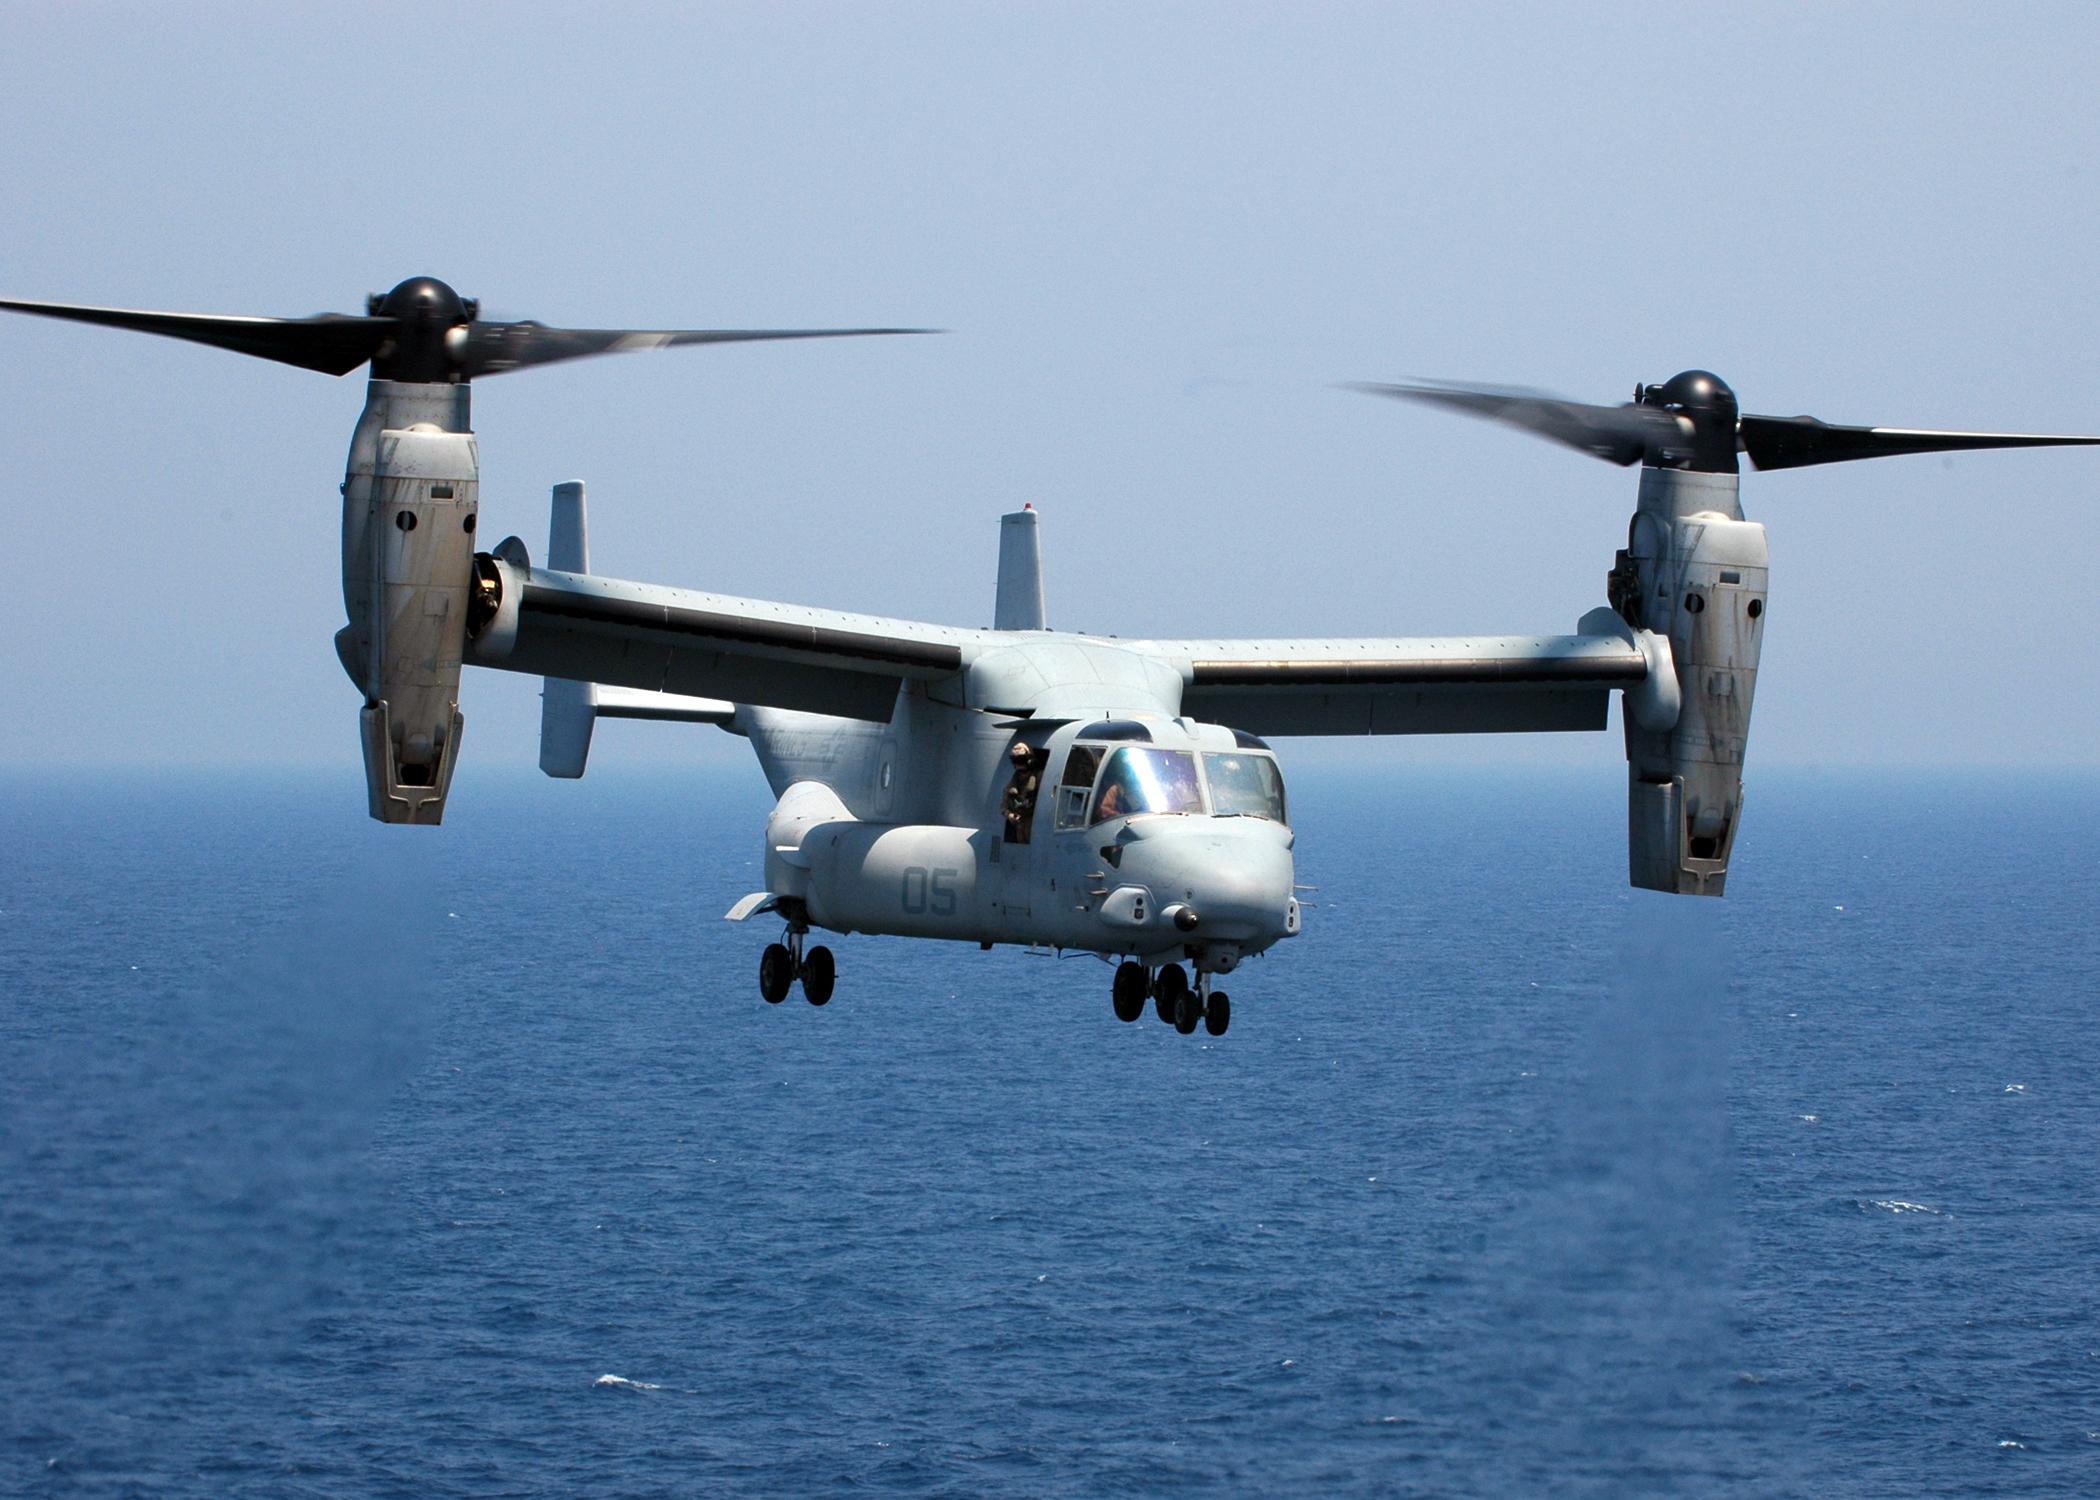 Конвертоплан MV-22 Osprey http://http://commons.wikimedia.org/ - ВМС США продолжают поиск члена экипажа конвертоплана MV-22 Osprey | Военно-исторический портал Warspot.ru